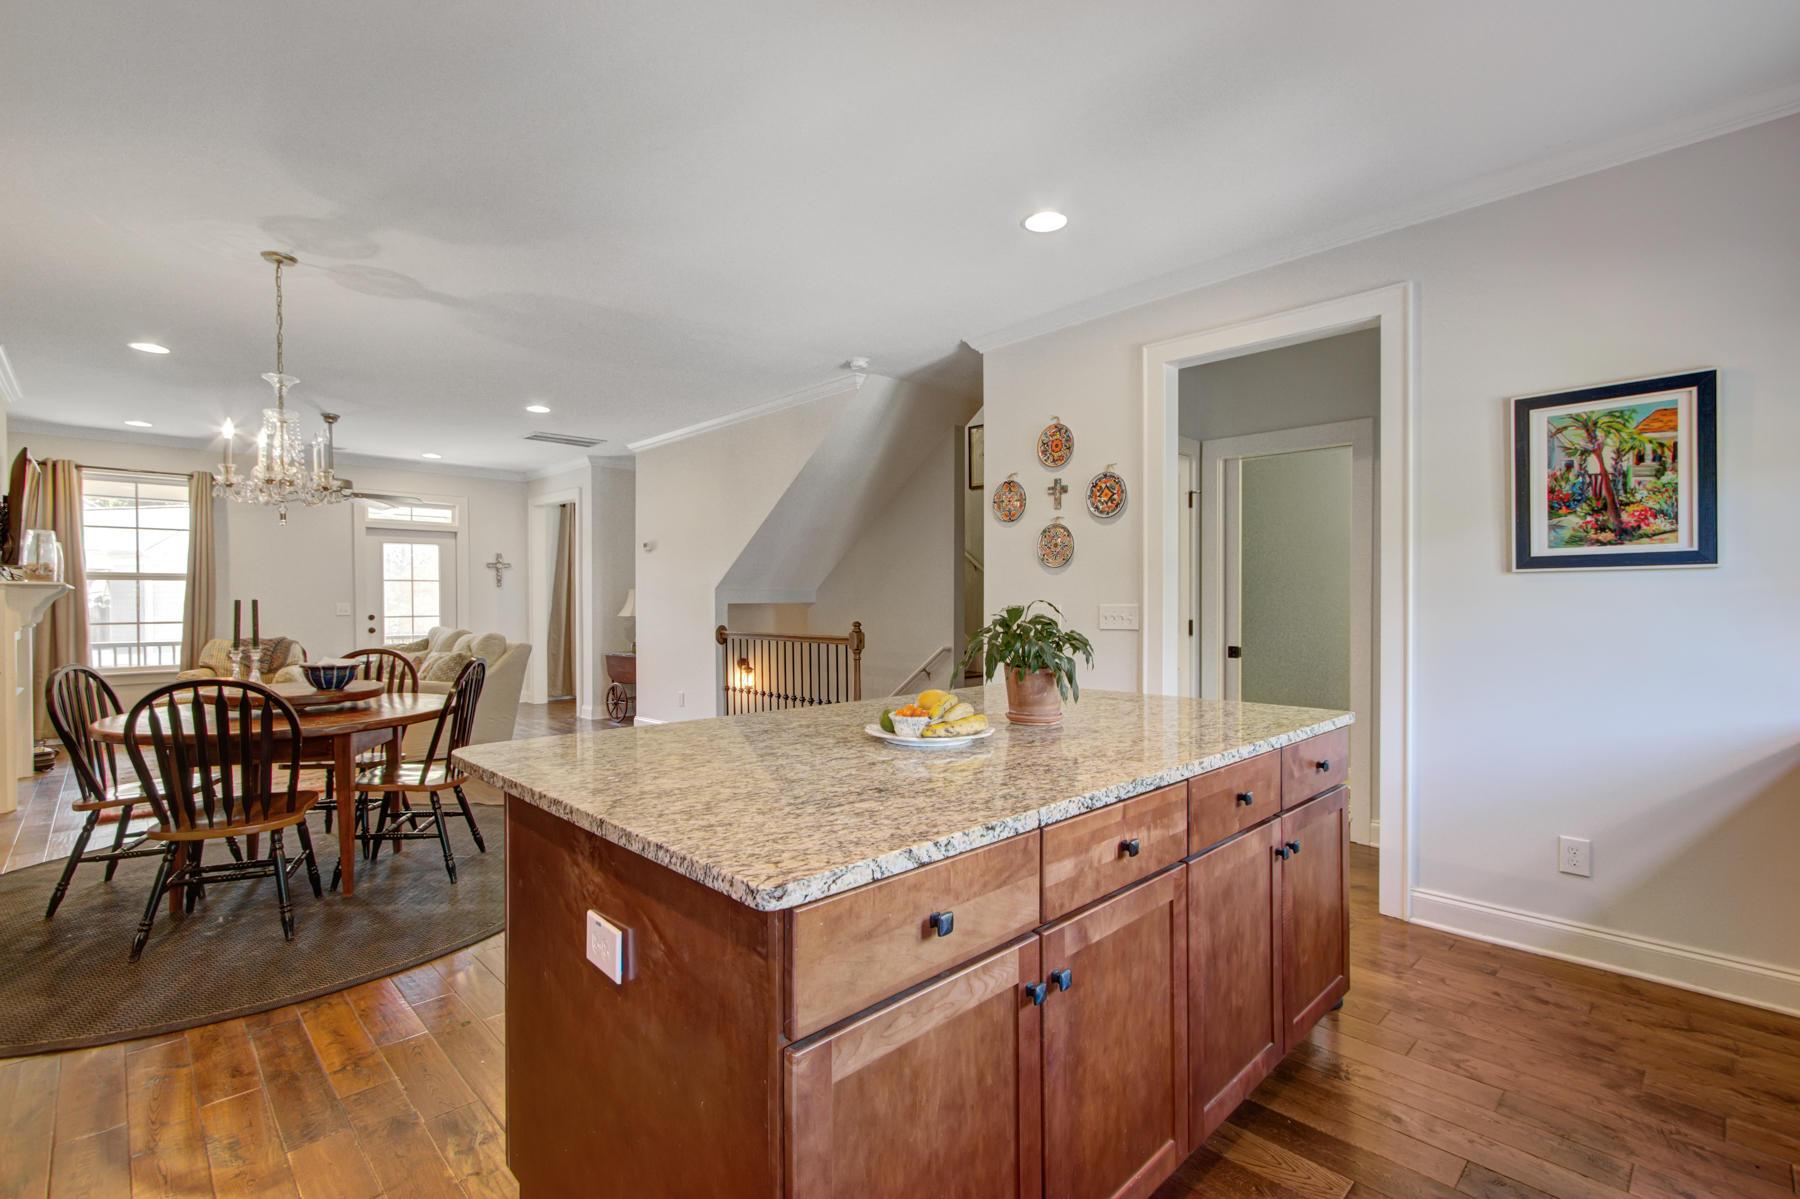 Etiwan Pointe Homes For Sale - 254 Slipper Shell, Mount Pleasant, SC - 18